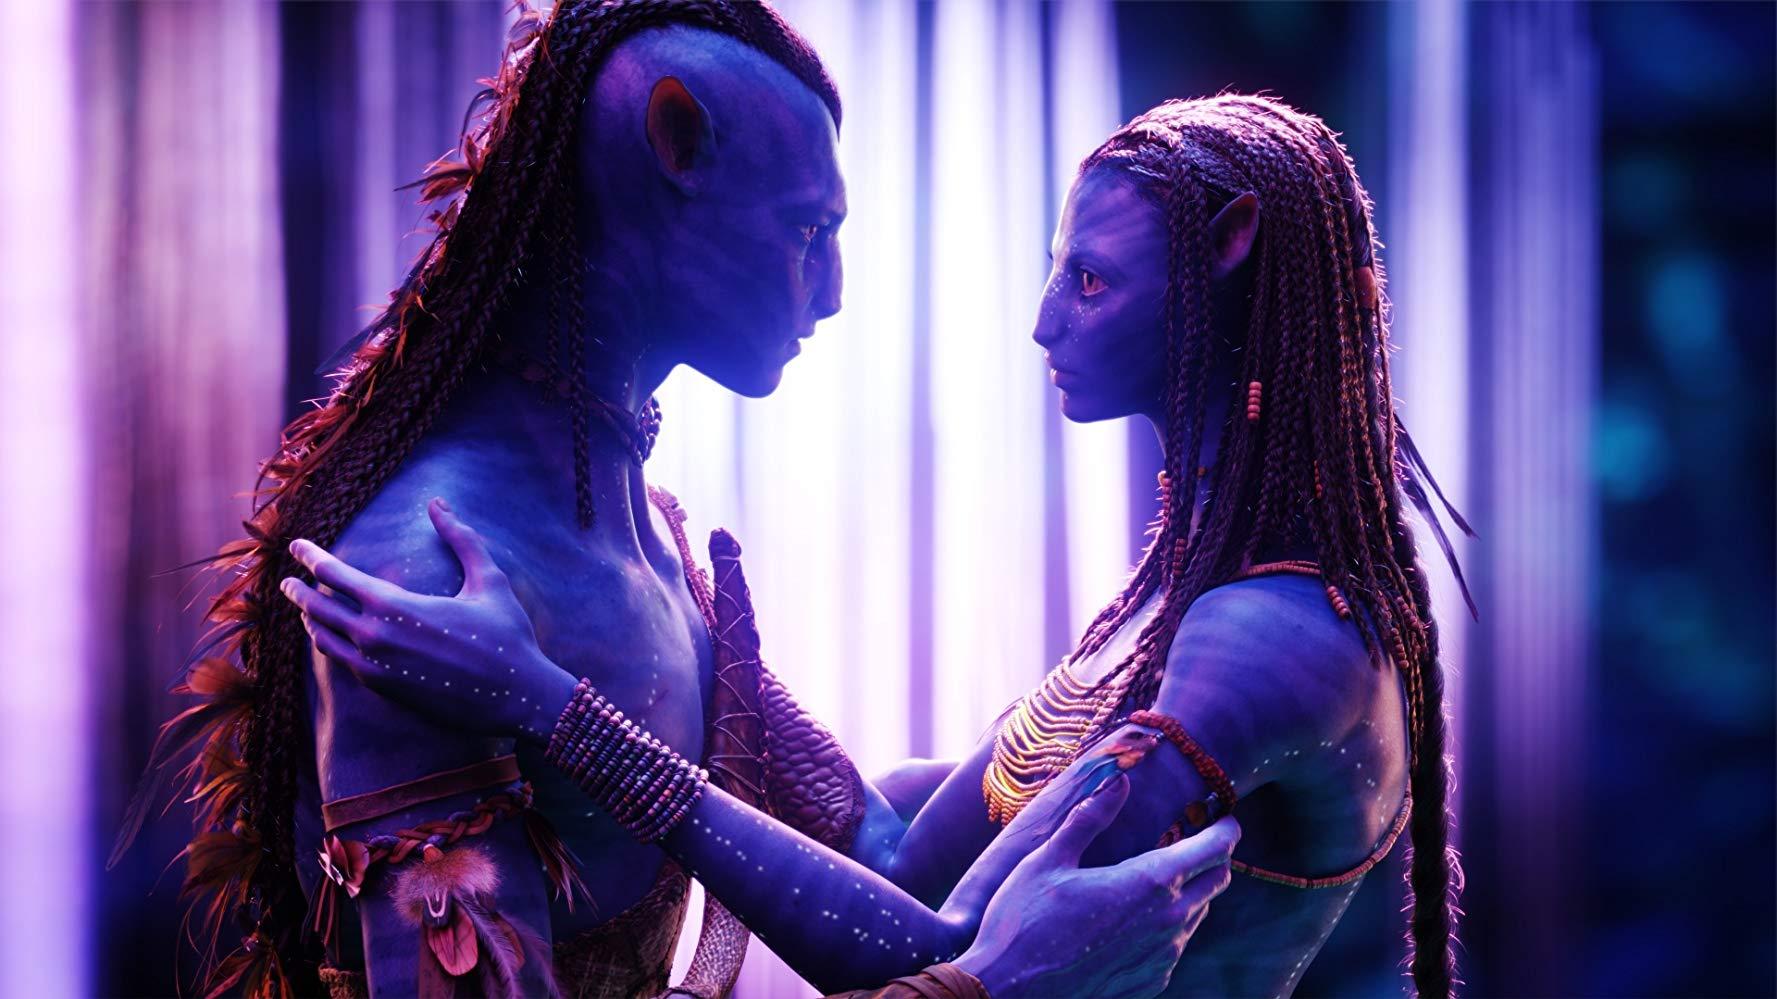 Avatar 2 box office